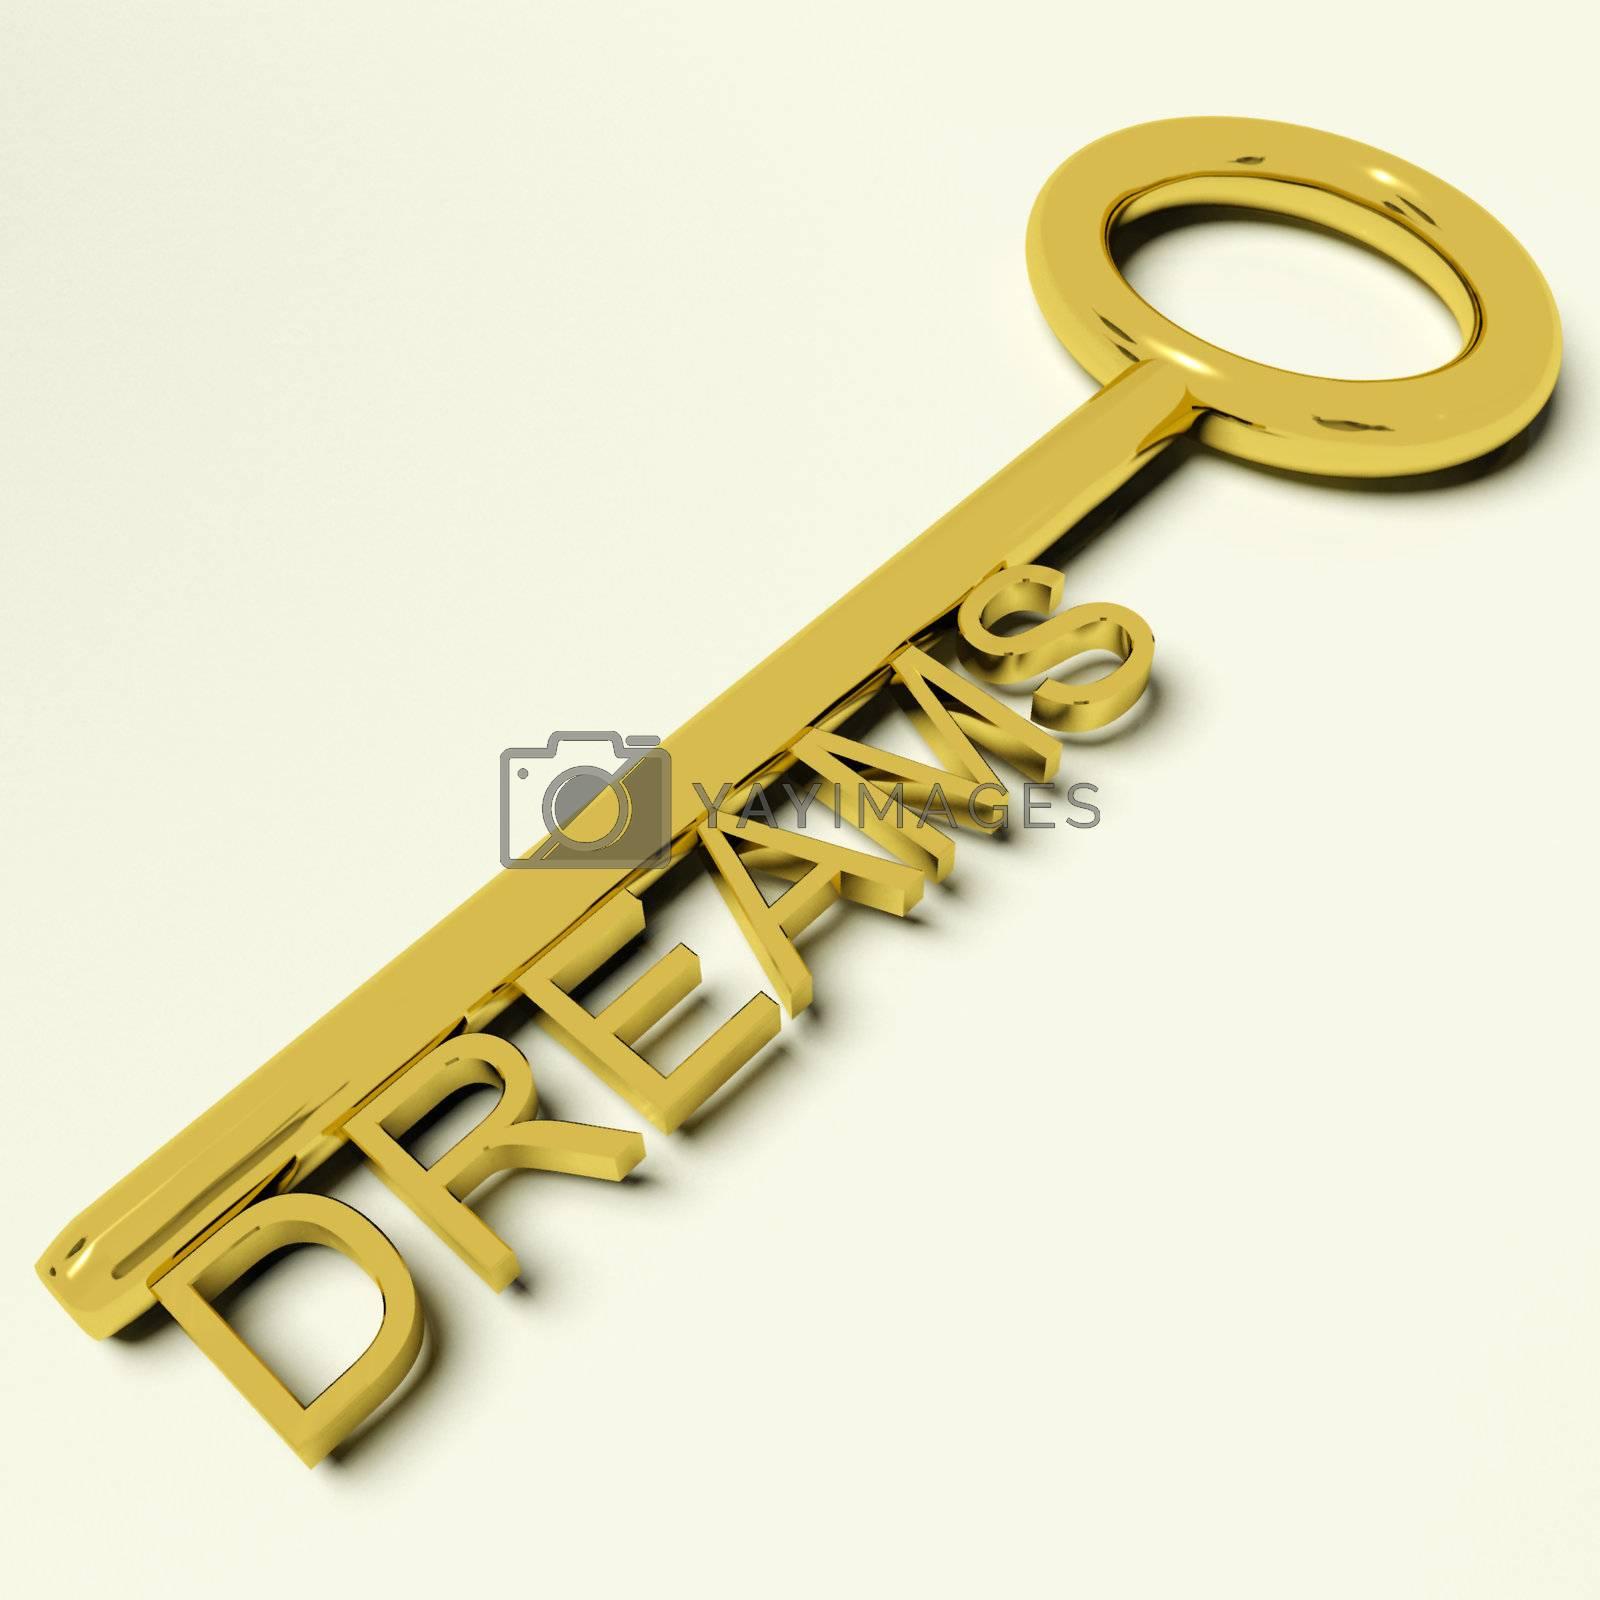 Dreams Gold Key Representing Hopes And Ambition